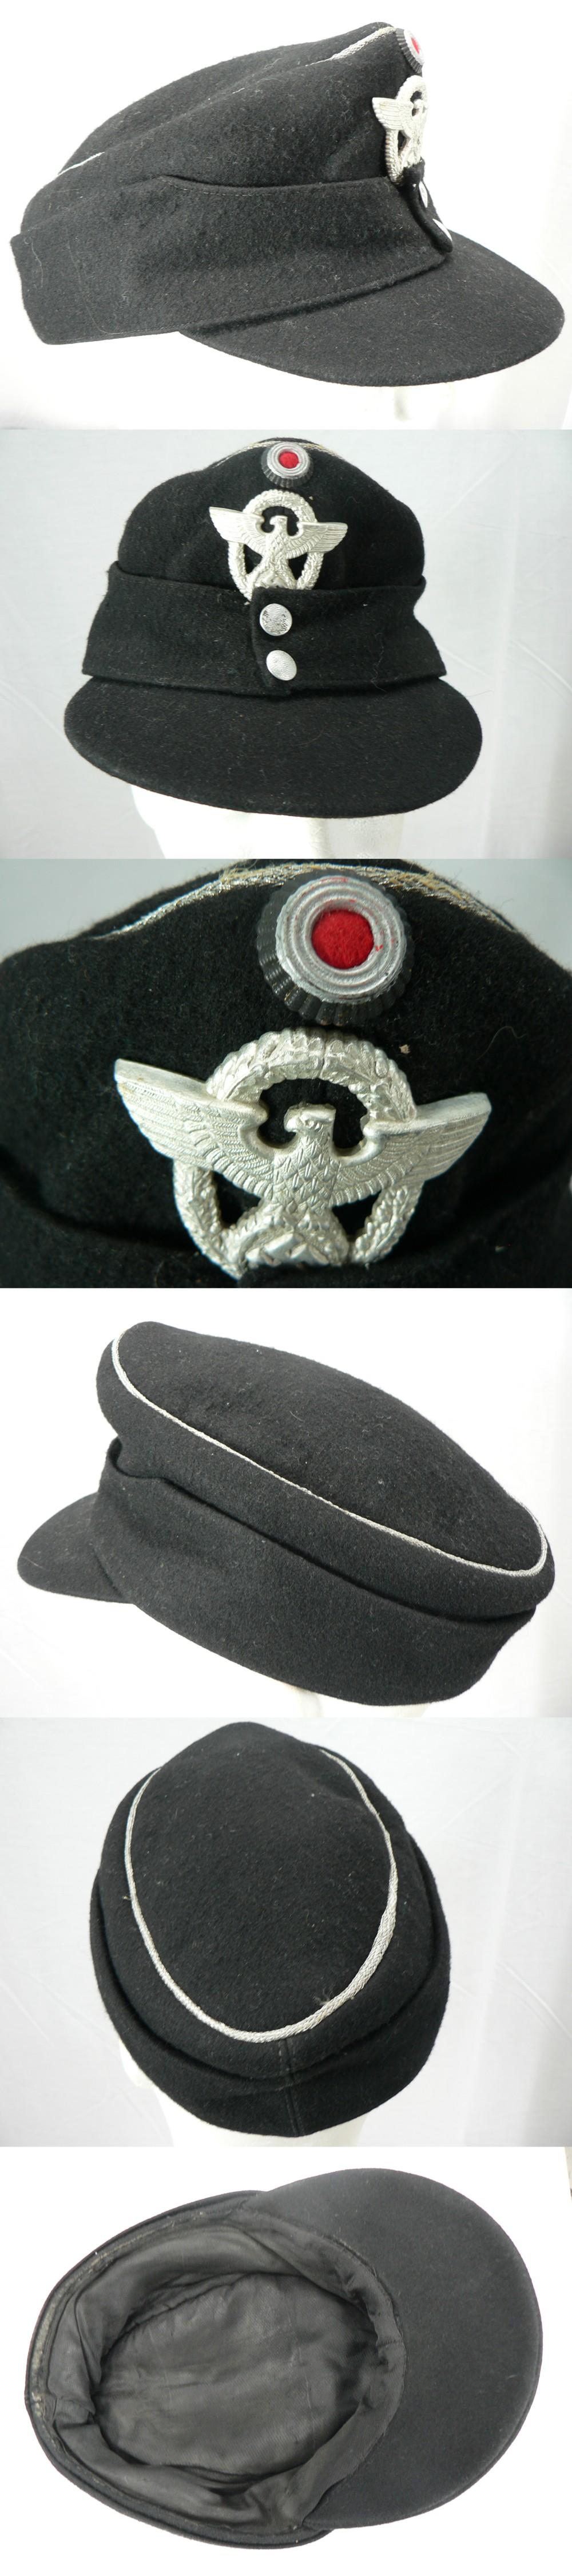 CS49843049 :: 1939-45 WWII GERMAN NAZI OFFICER POLICE CAP